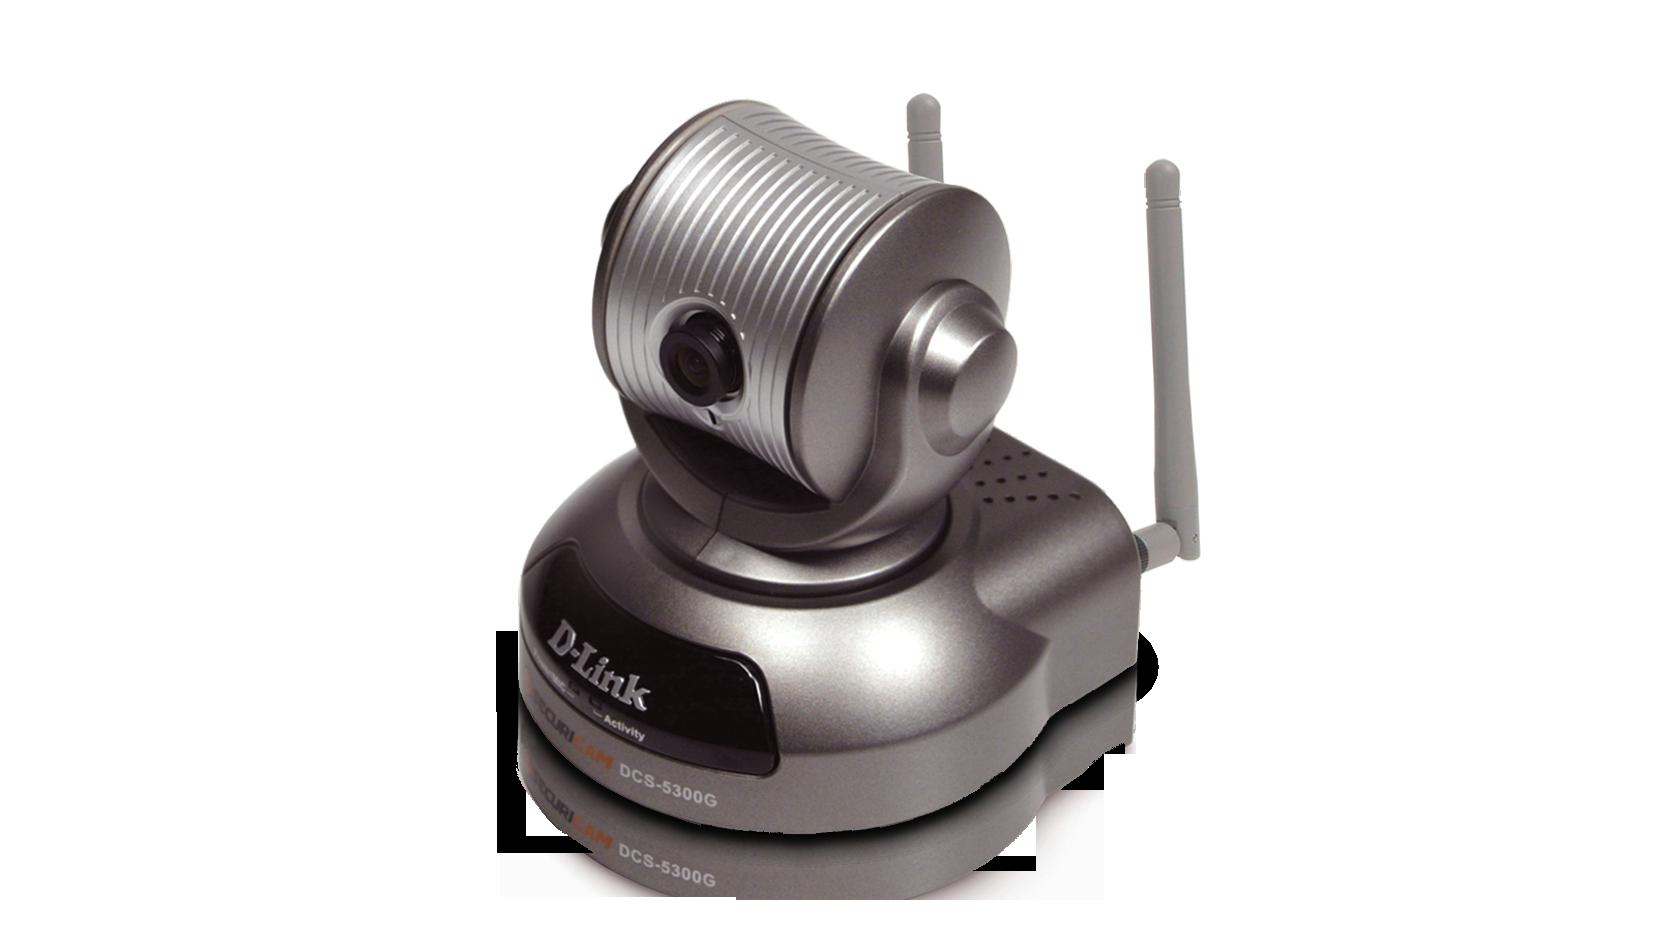 D-Link DCS-5300G Camera Drivers Download Free